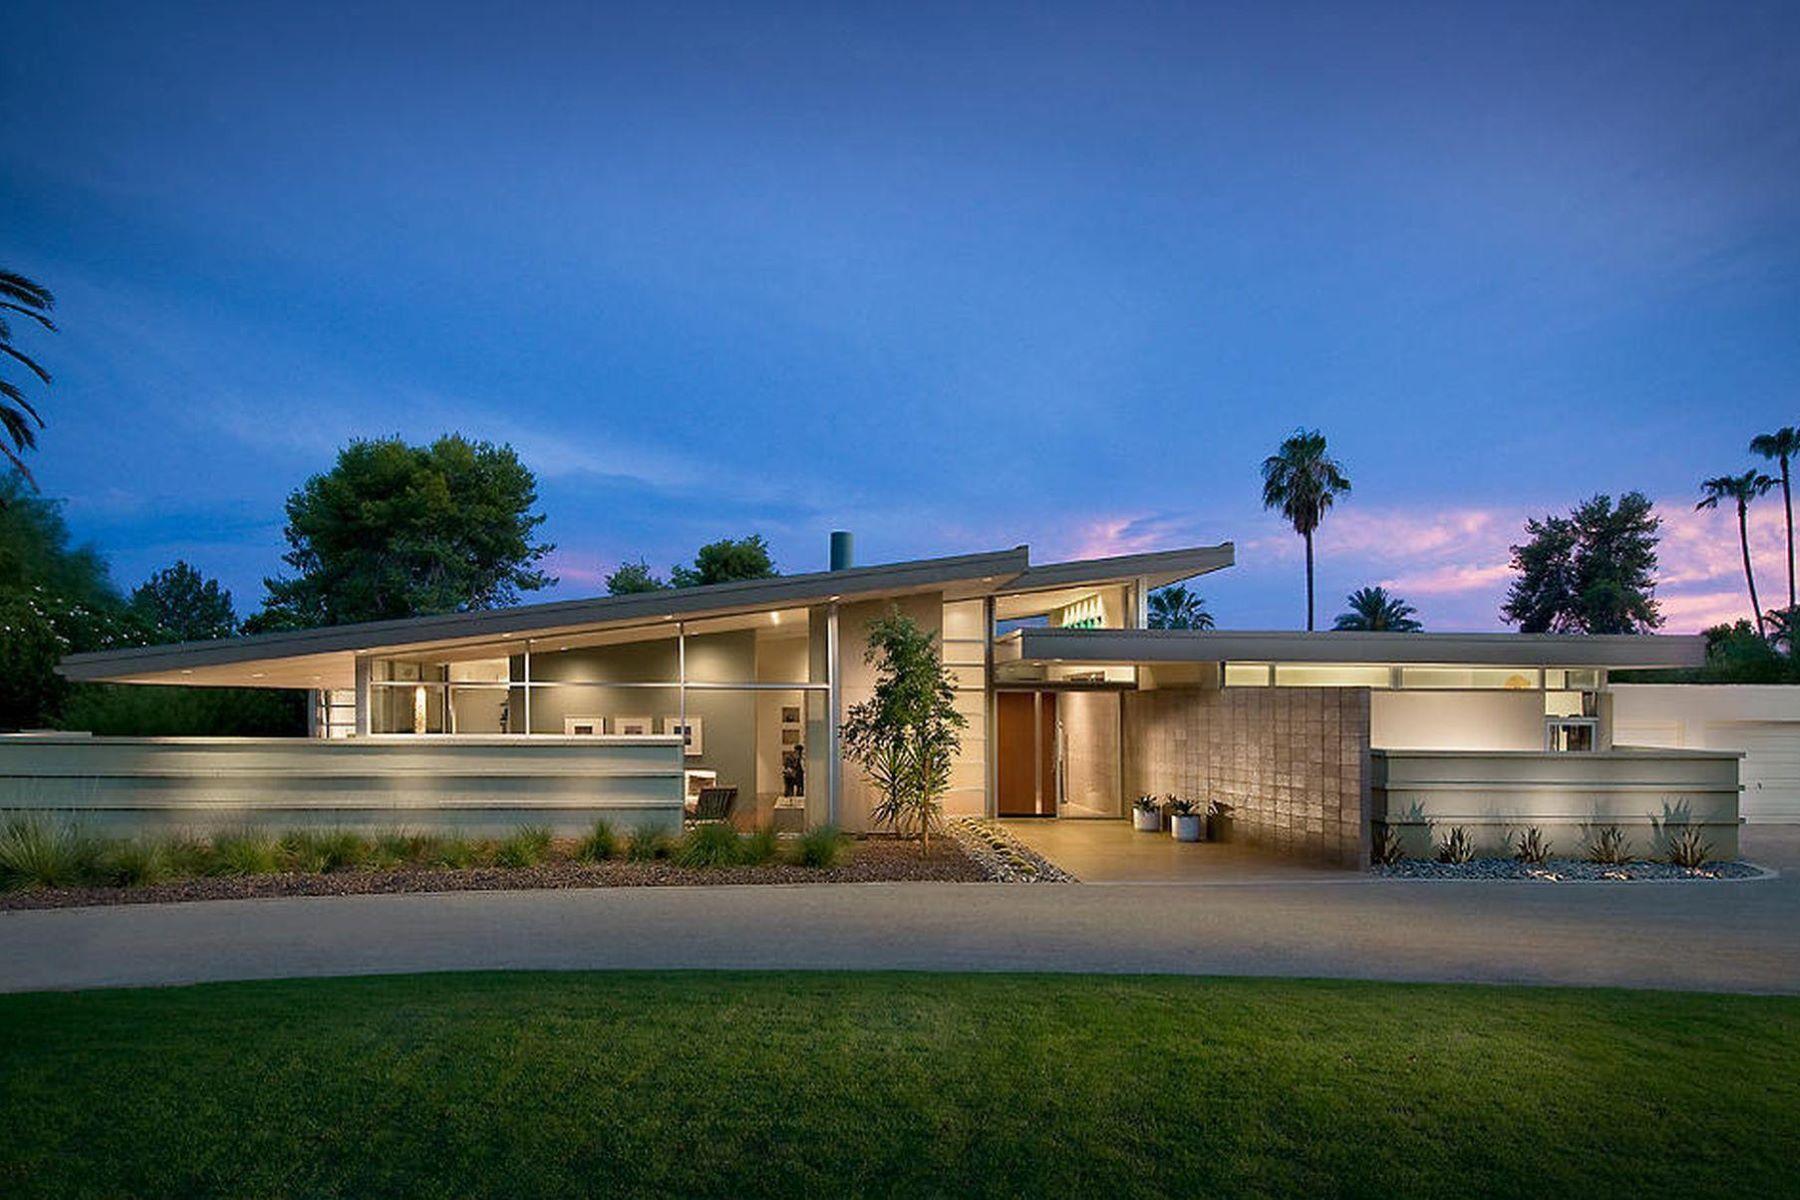 Single Family Homes for Active at Edgewood Estates 5601 E MONTECITO AVE Phoenix, Arizona 85018 United States